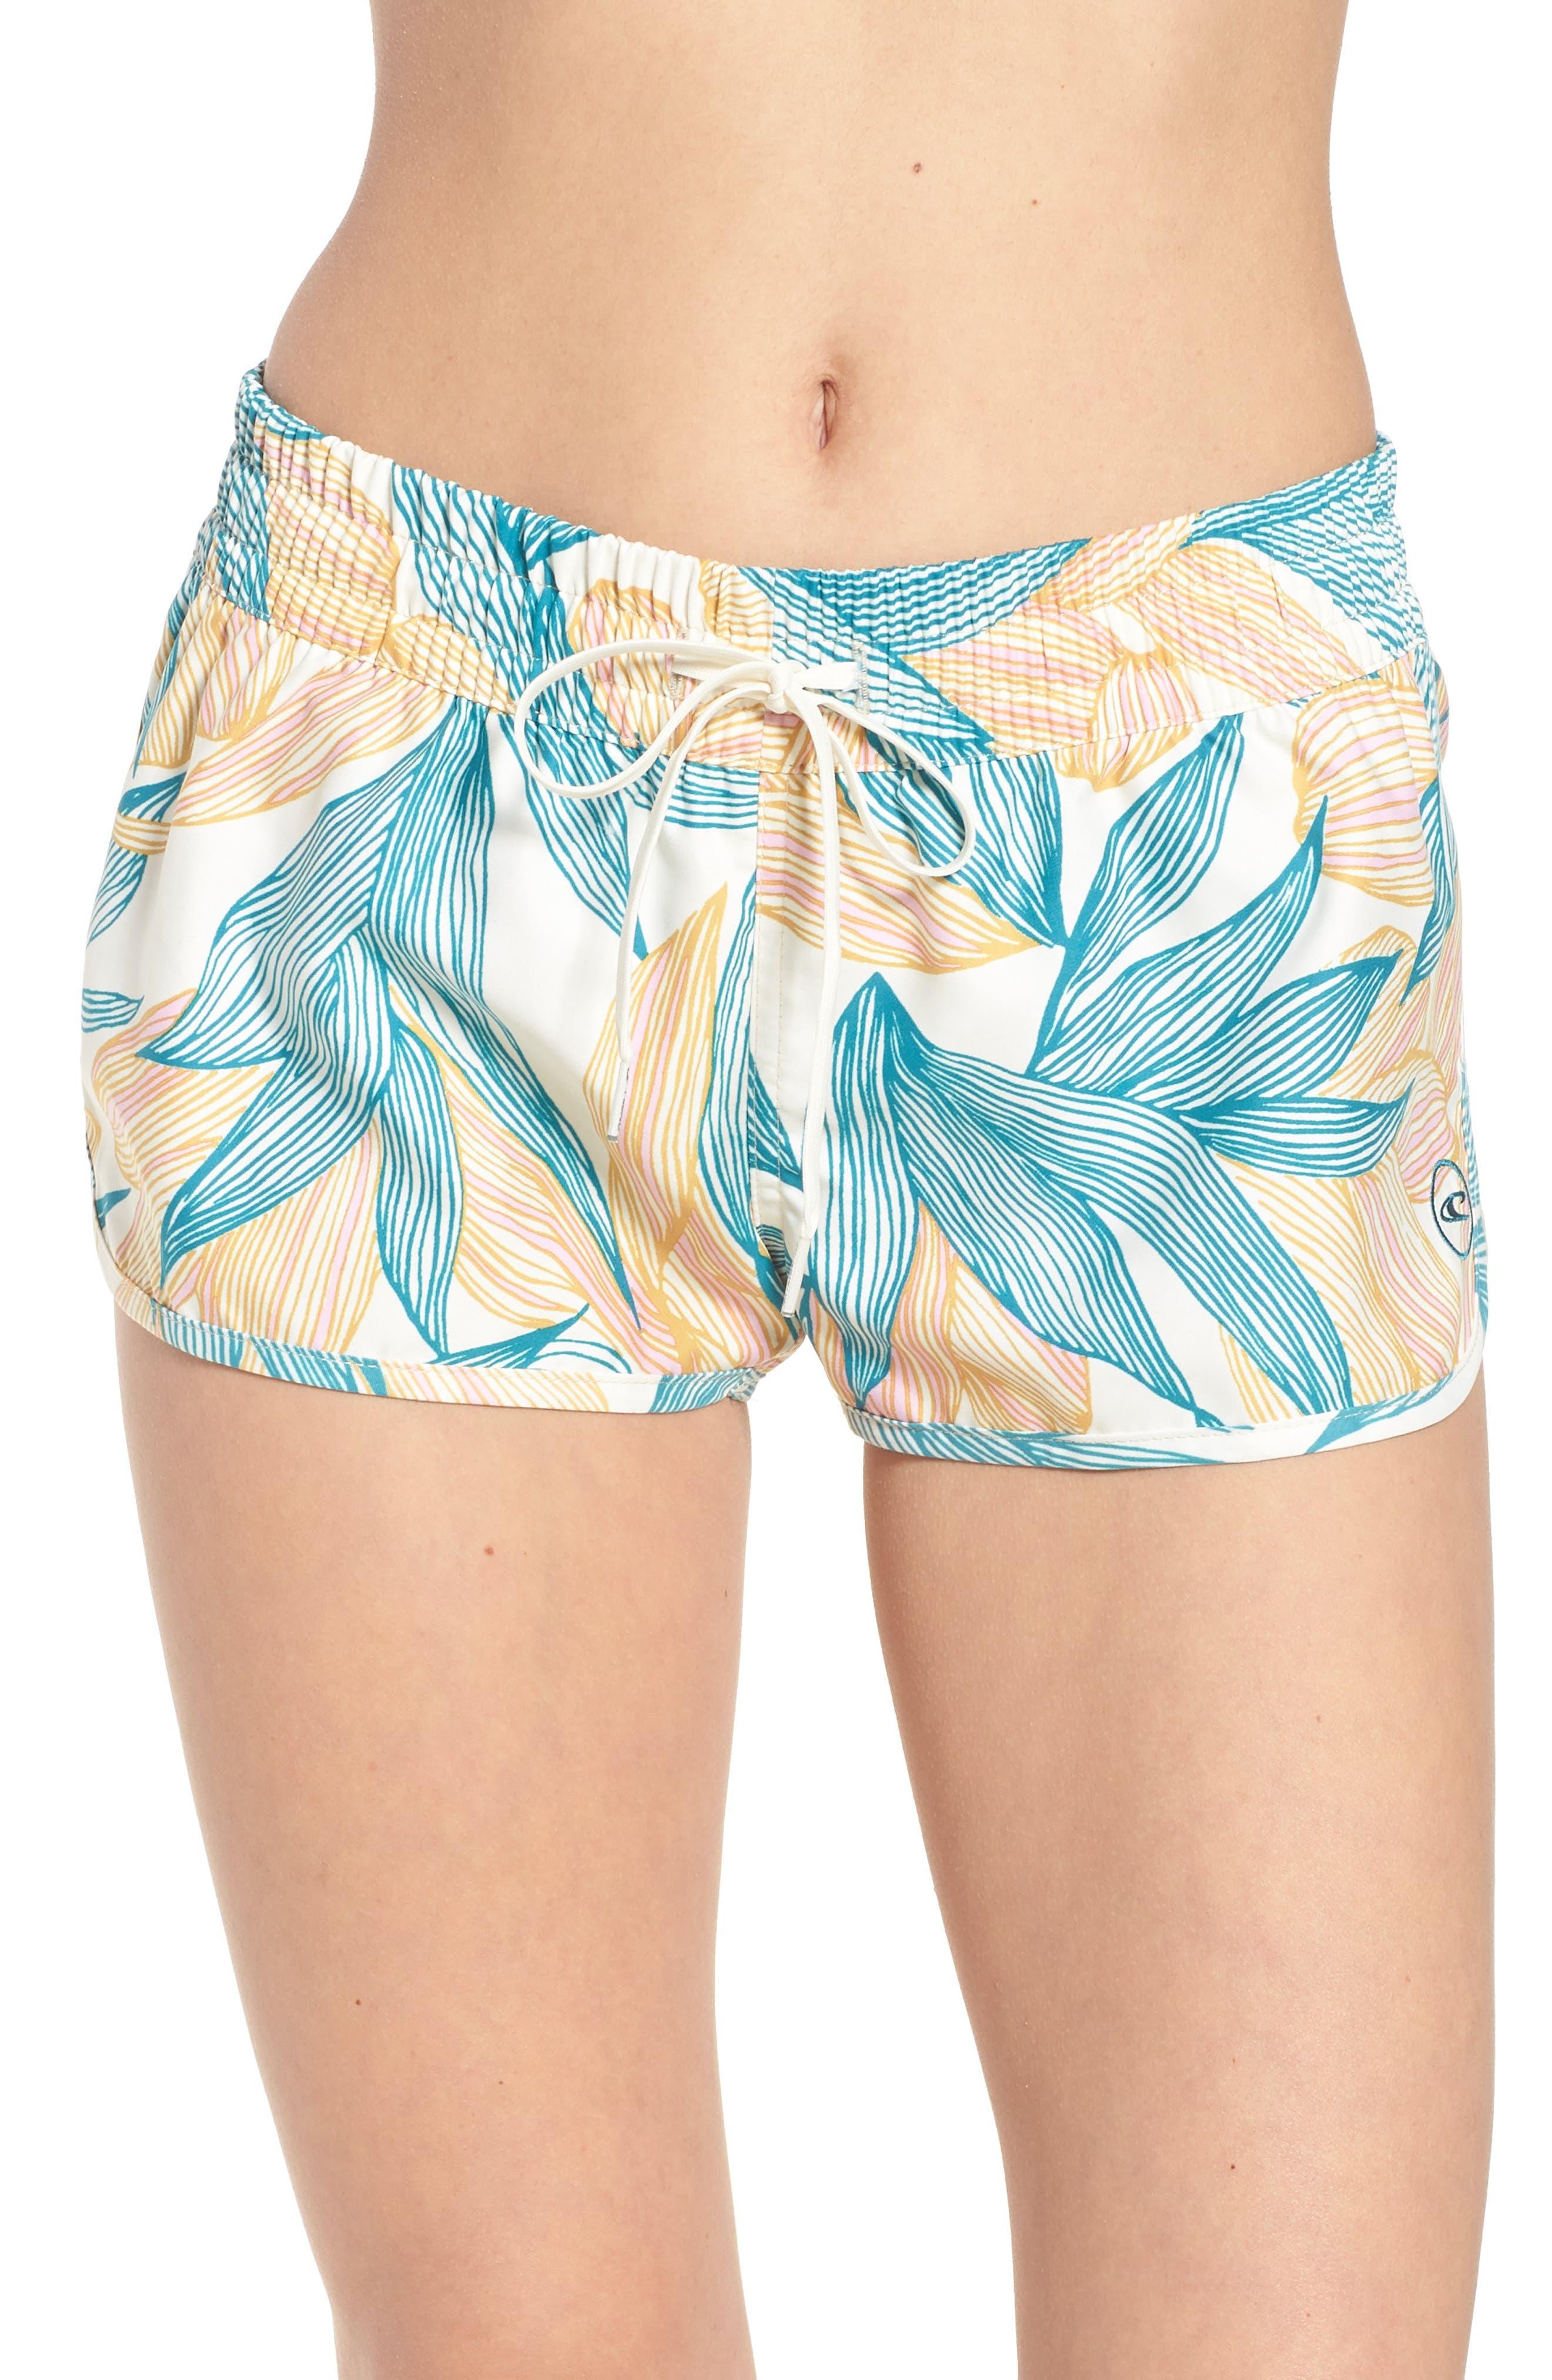 Bayside 2 Dynasuede Board Shorts,                             Main thumbnail 1, color,                             Island Turquoise